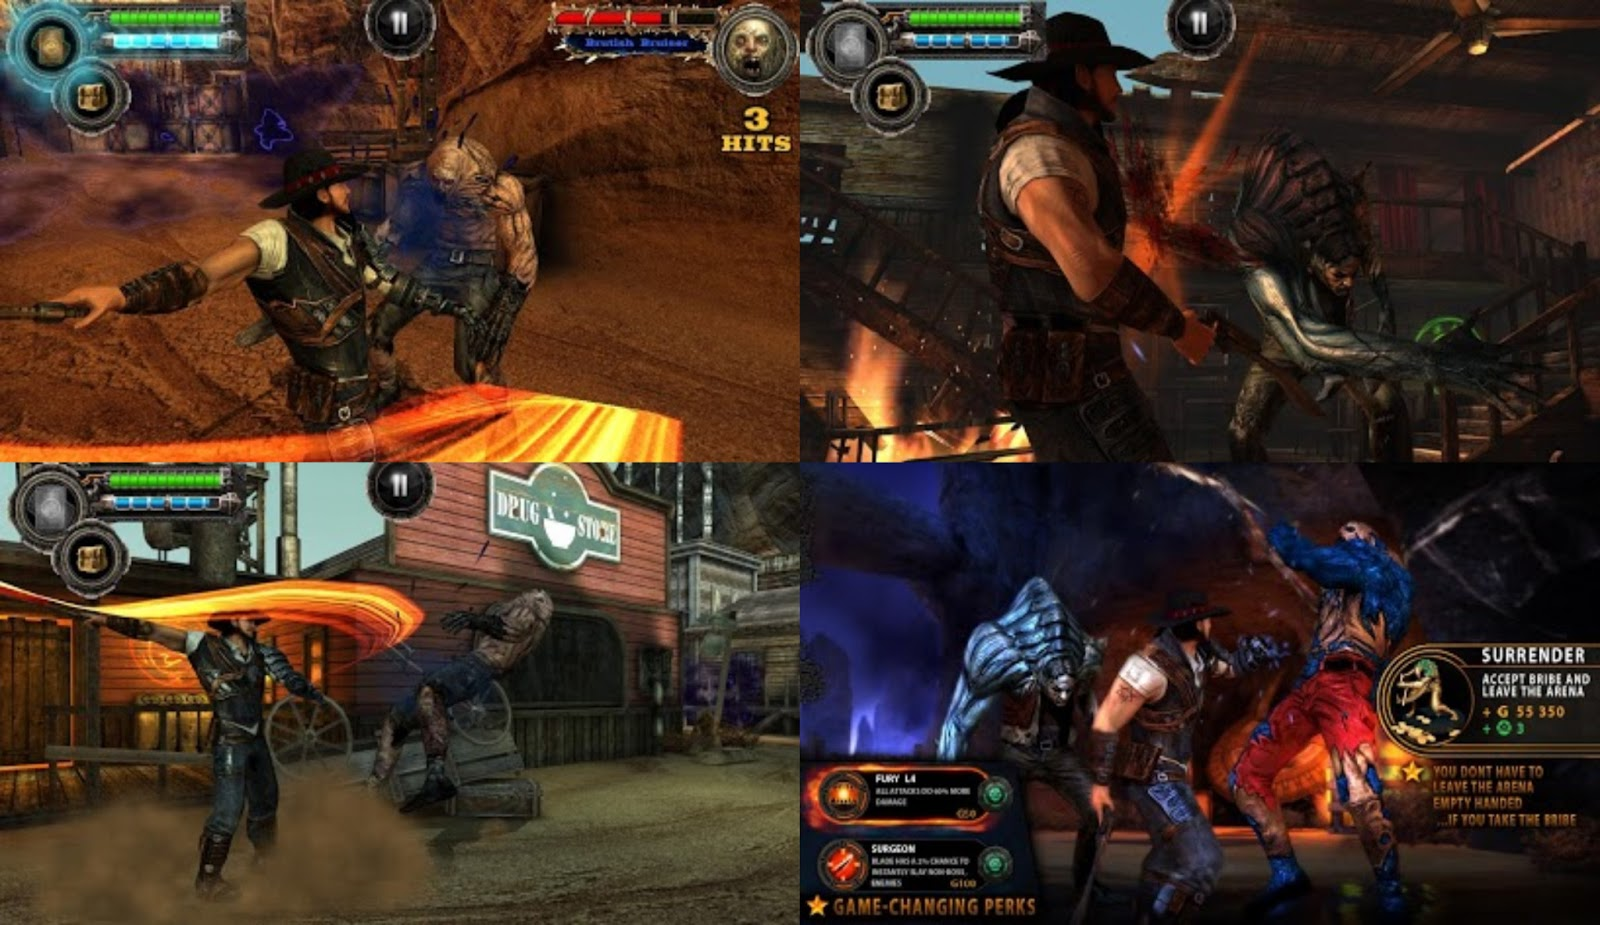 download game apk street fighter